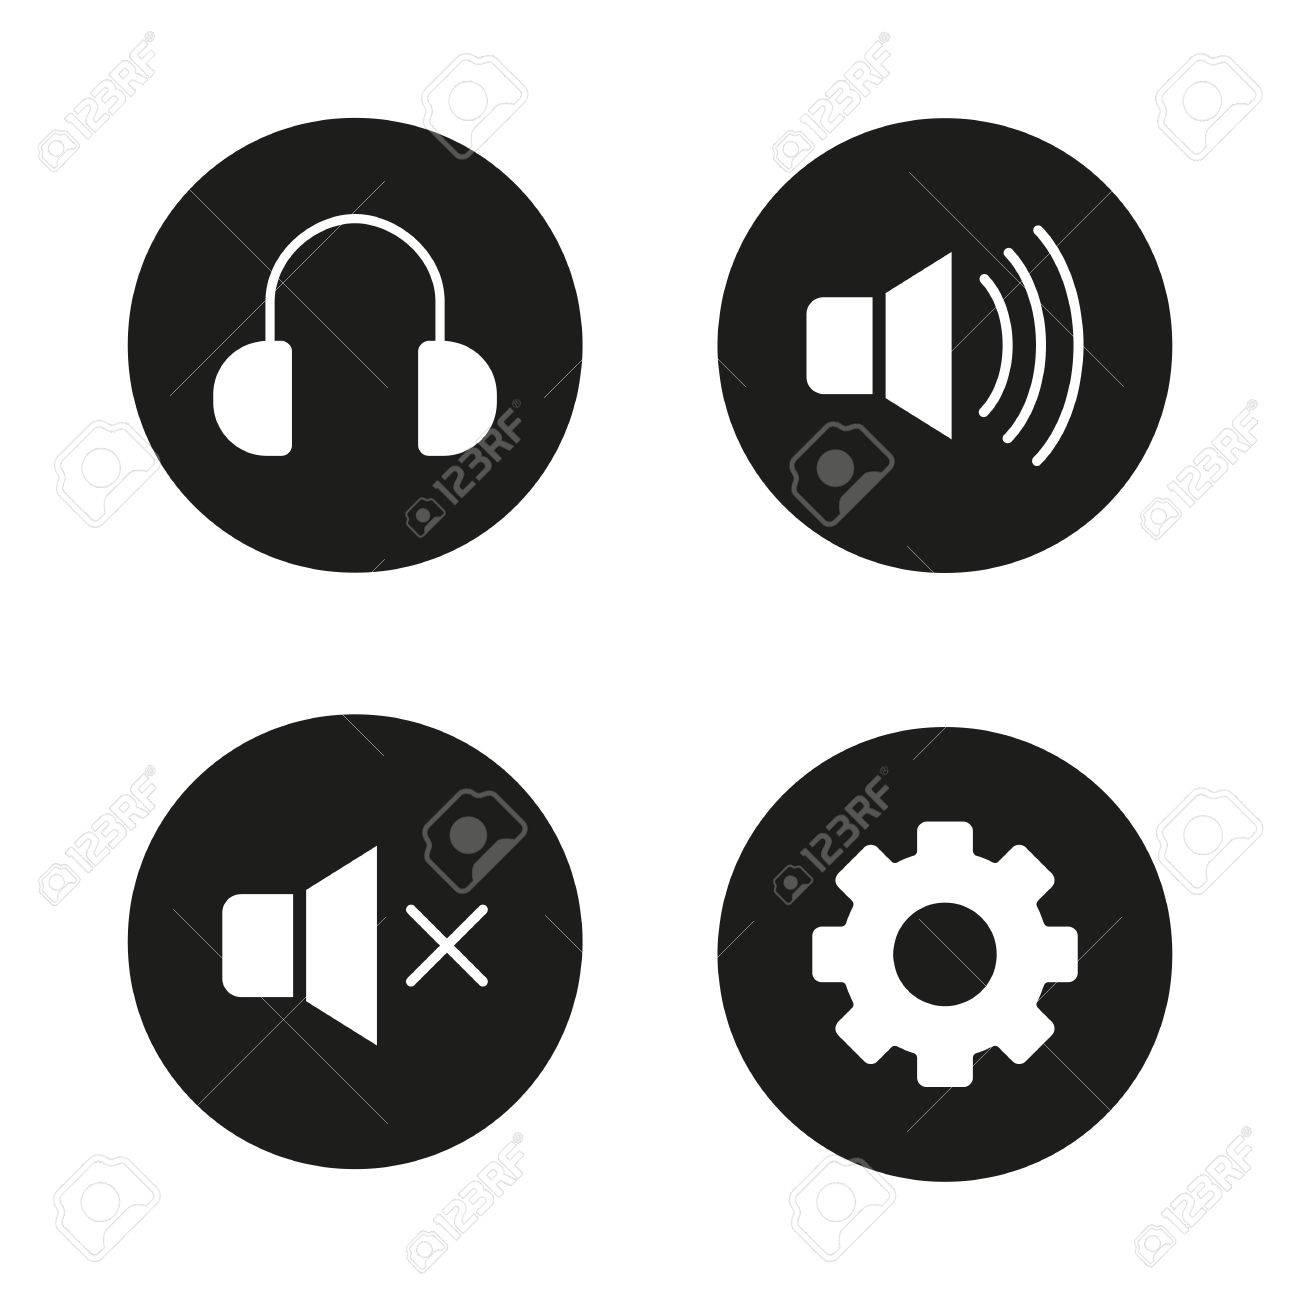 Music player interface black icons set headphones mute on music player interface black icons set headphones mute on mute off and settings biocorpaavc Choice Image